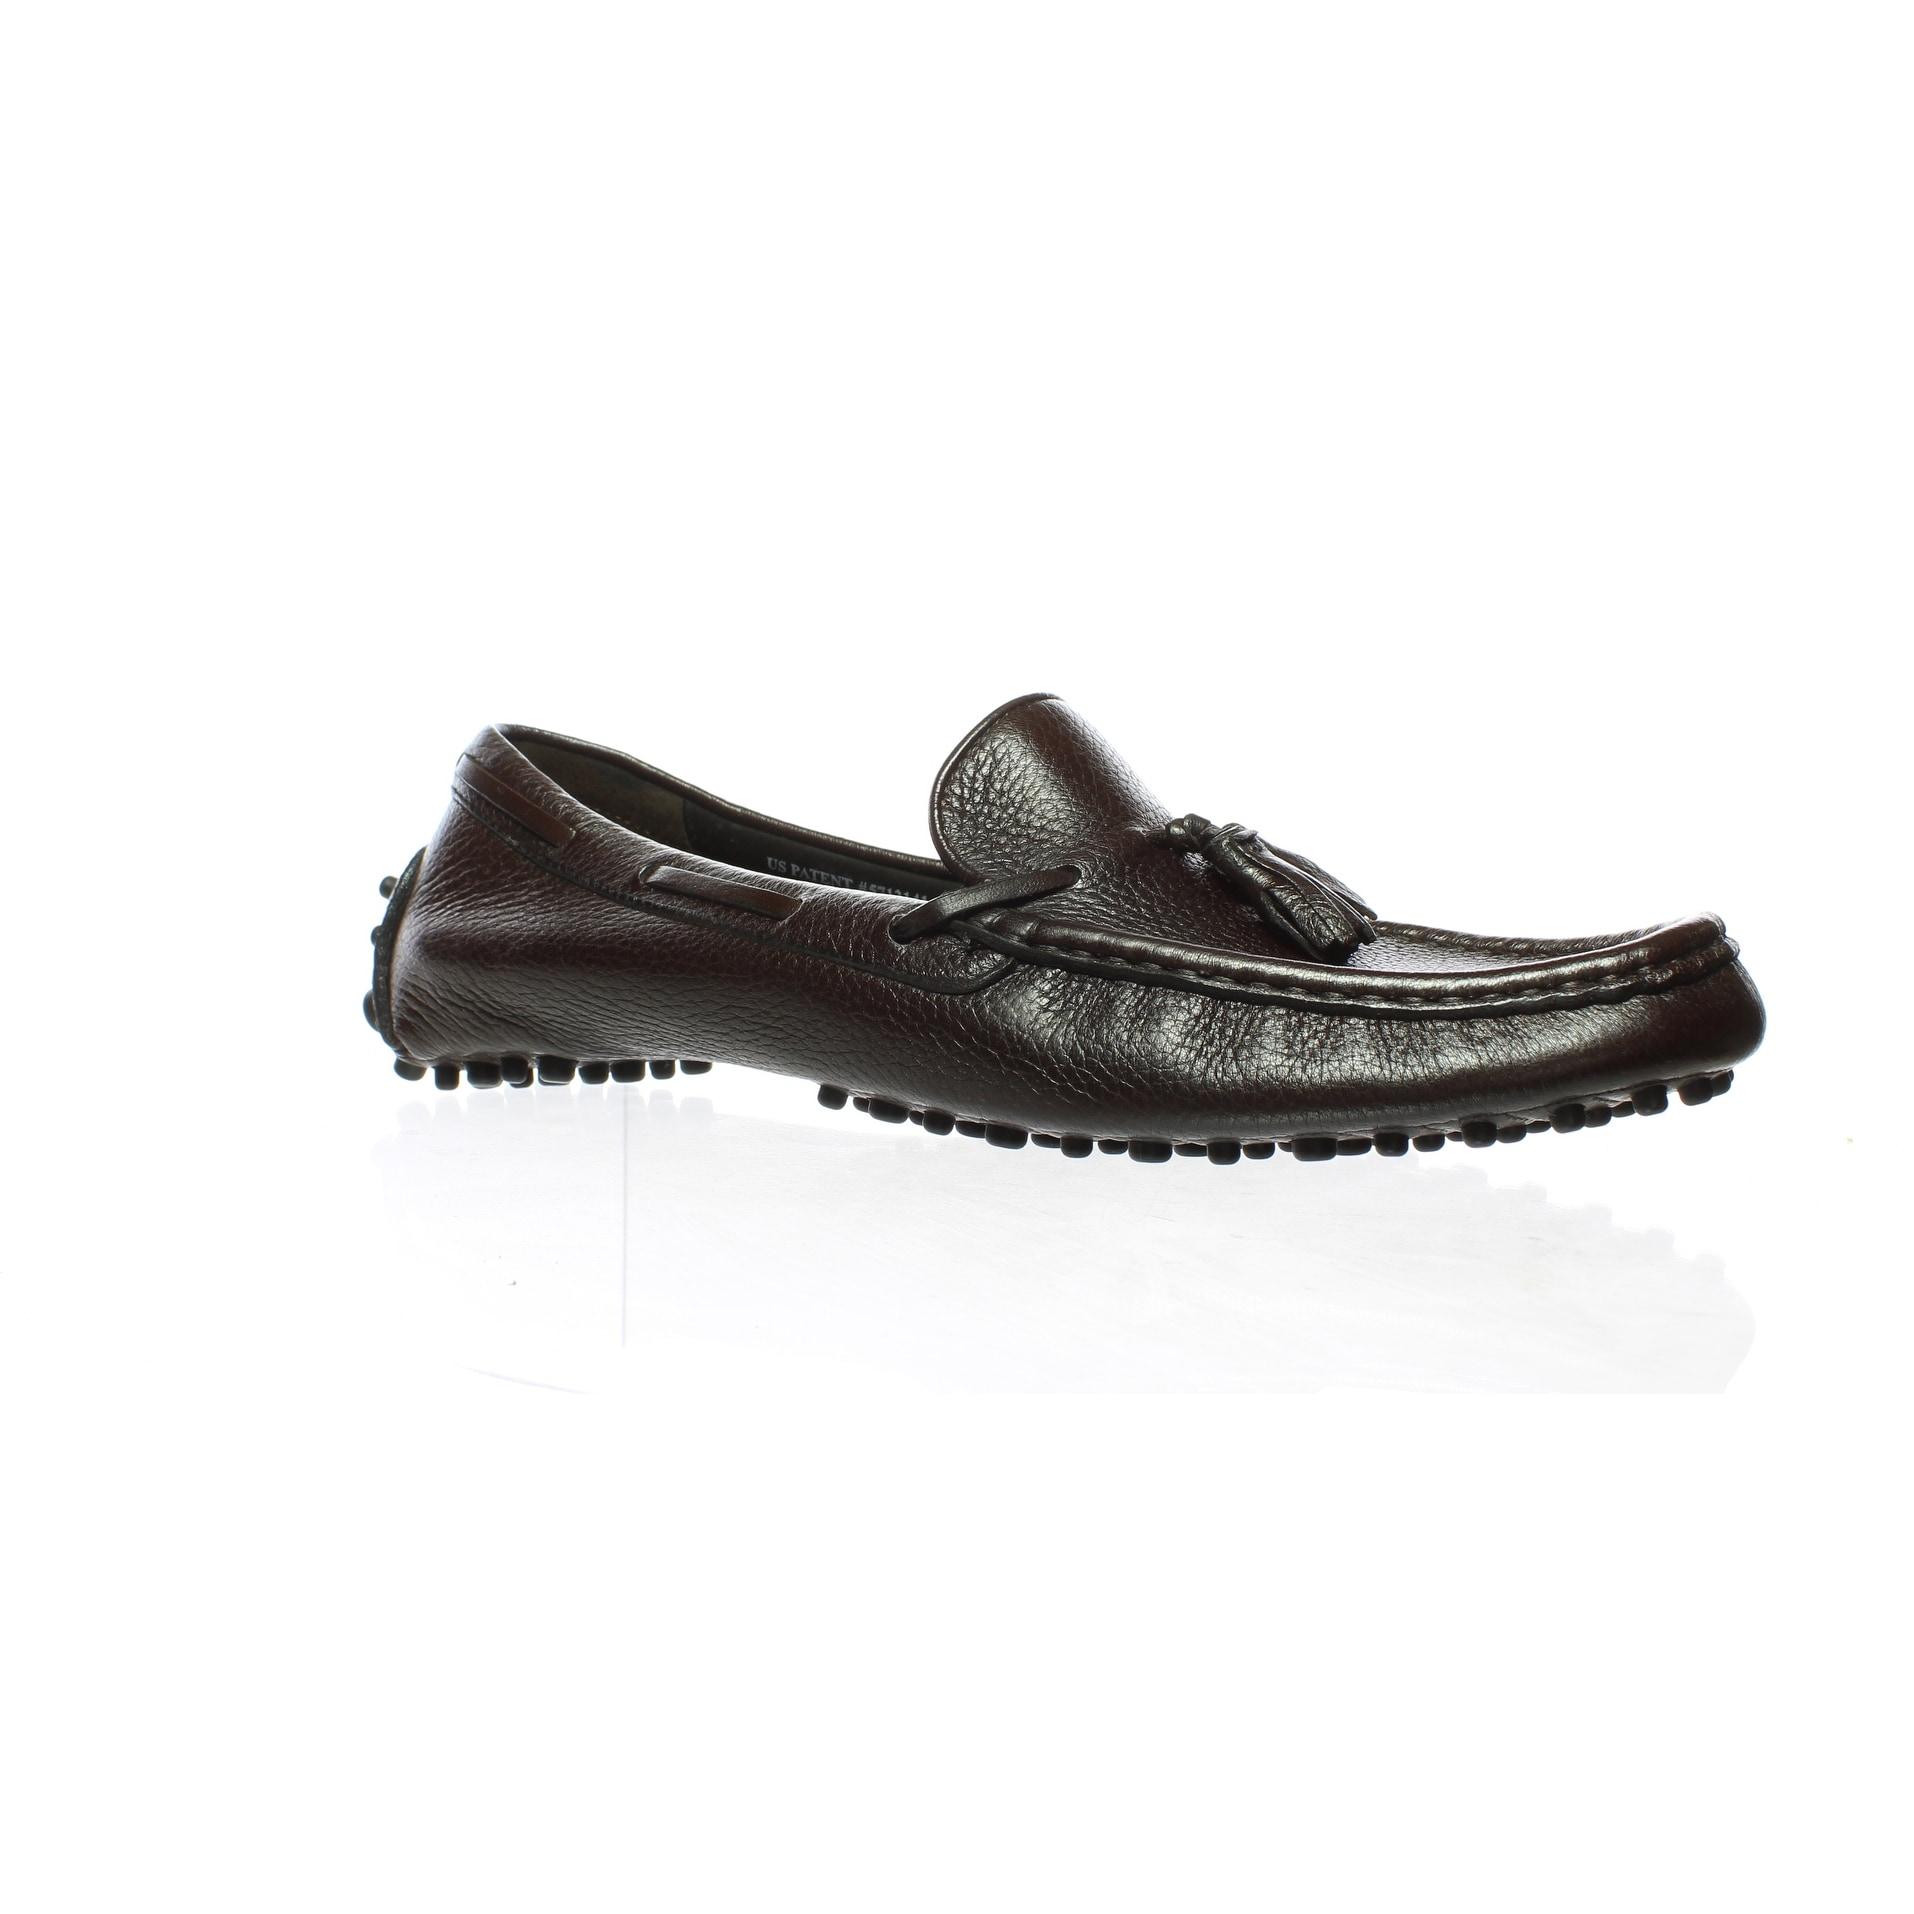 d41a51c8c Cole Haan Mens Air Lorenzo Drvr Tsl T.moro Deerskin Loafers Size 9.5